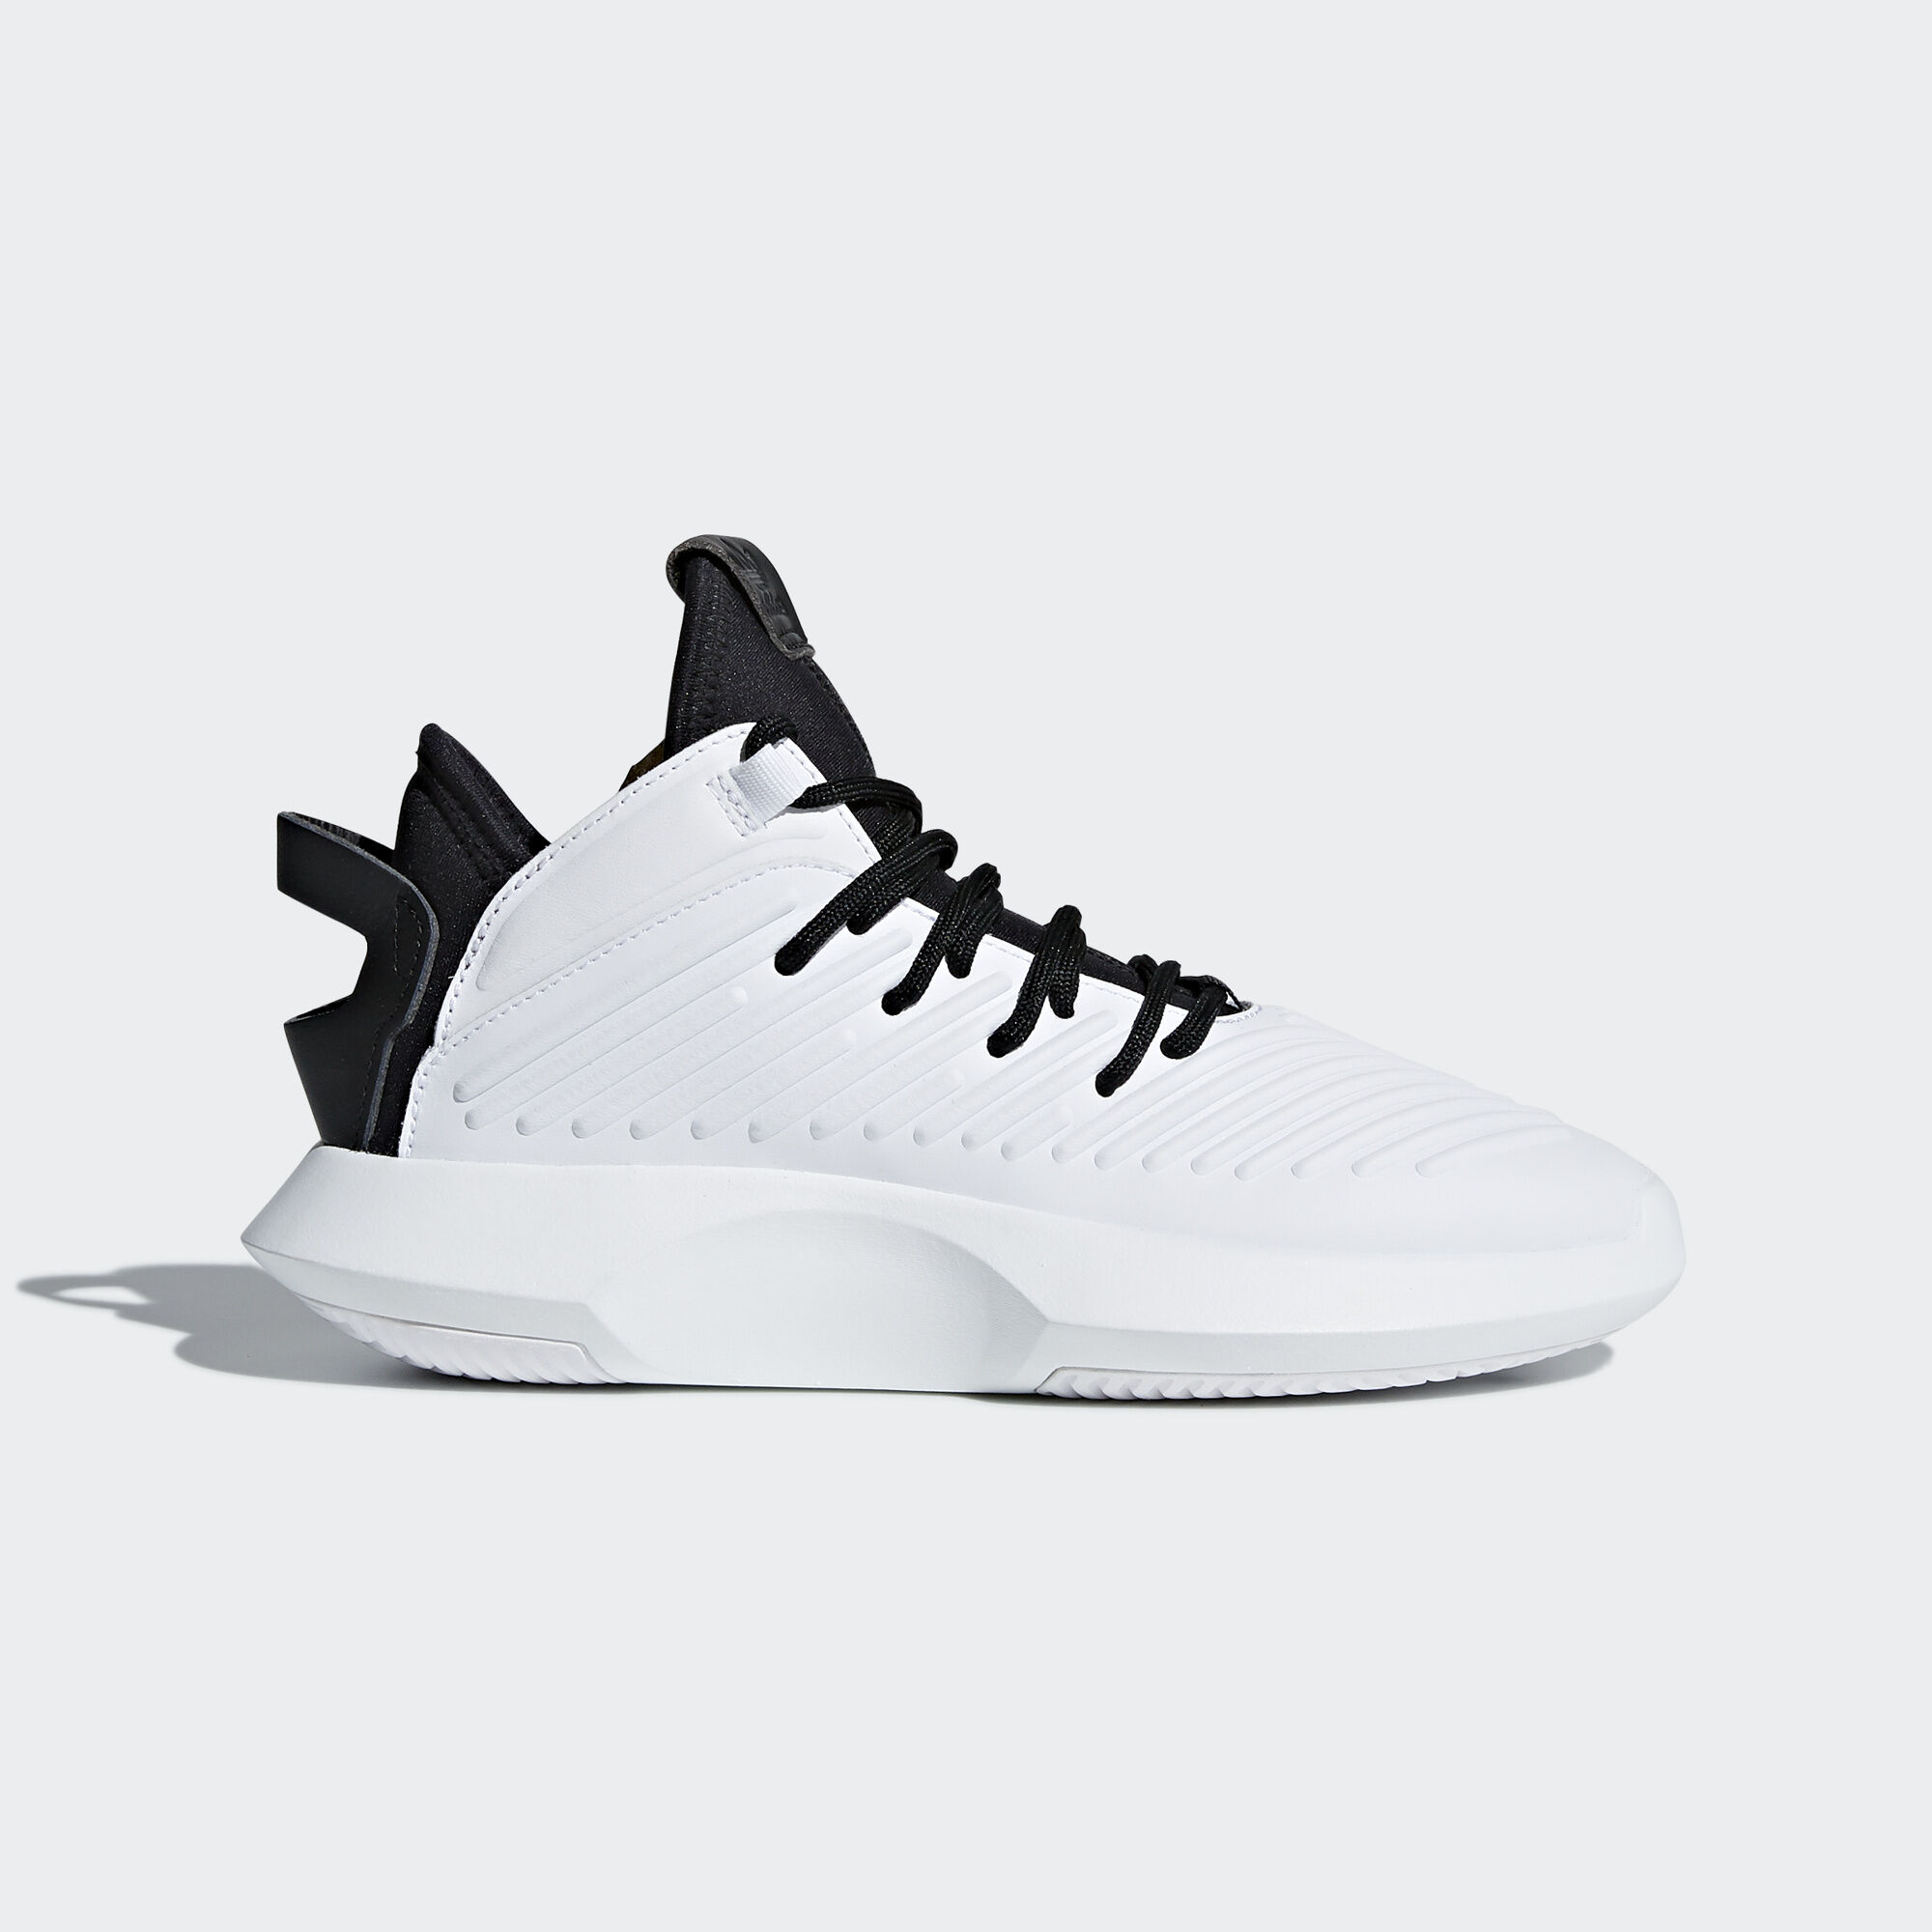 Adidas Zapatilla Crazy 1 ADV Superga 2311 Lamew - Zapatillas Mujer rlPYk